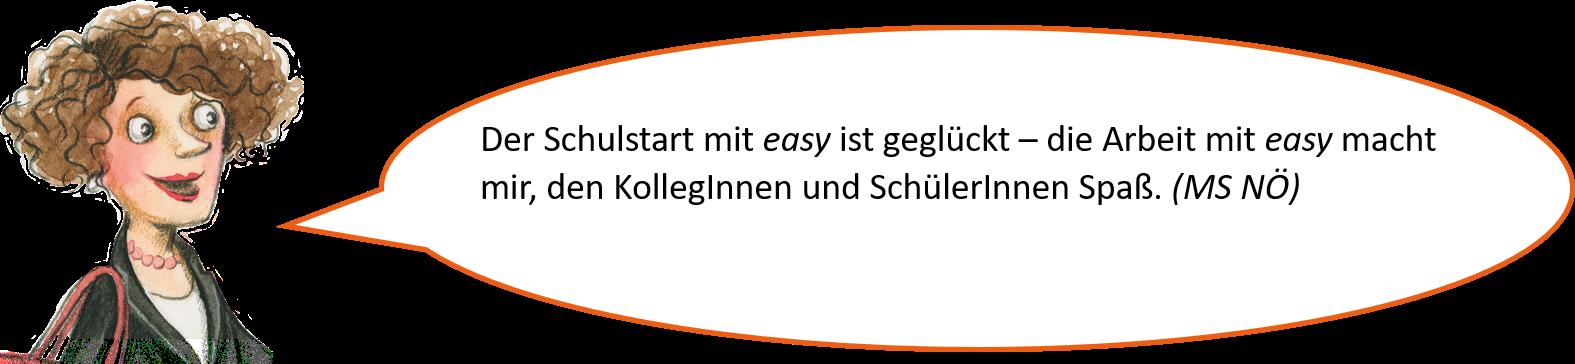 schulstart_ist_geglückt.